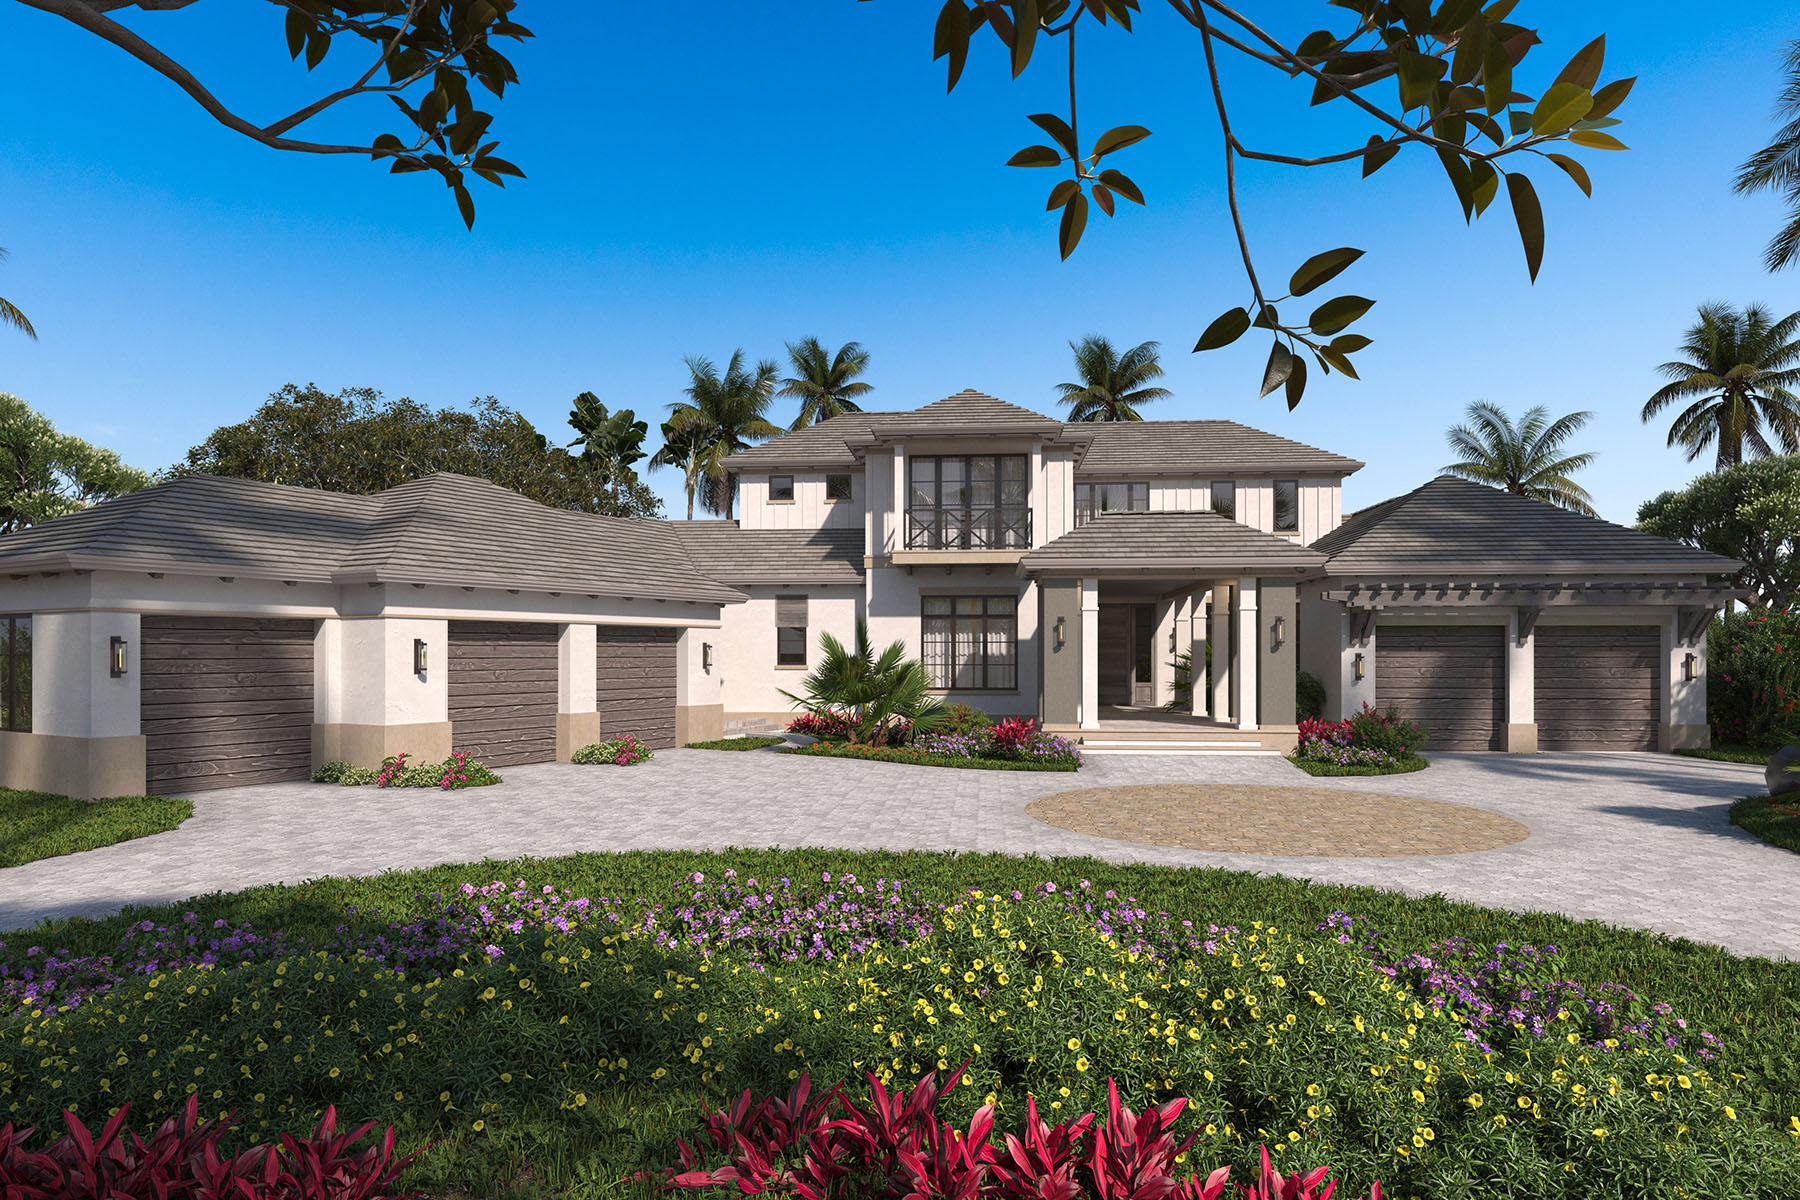 Single Family Homes por un Venta en AQUALANE SHORES 744 21st Avenue S Nápoles, Florida 34102 Estados Unidos